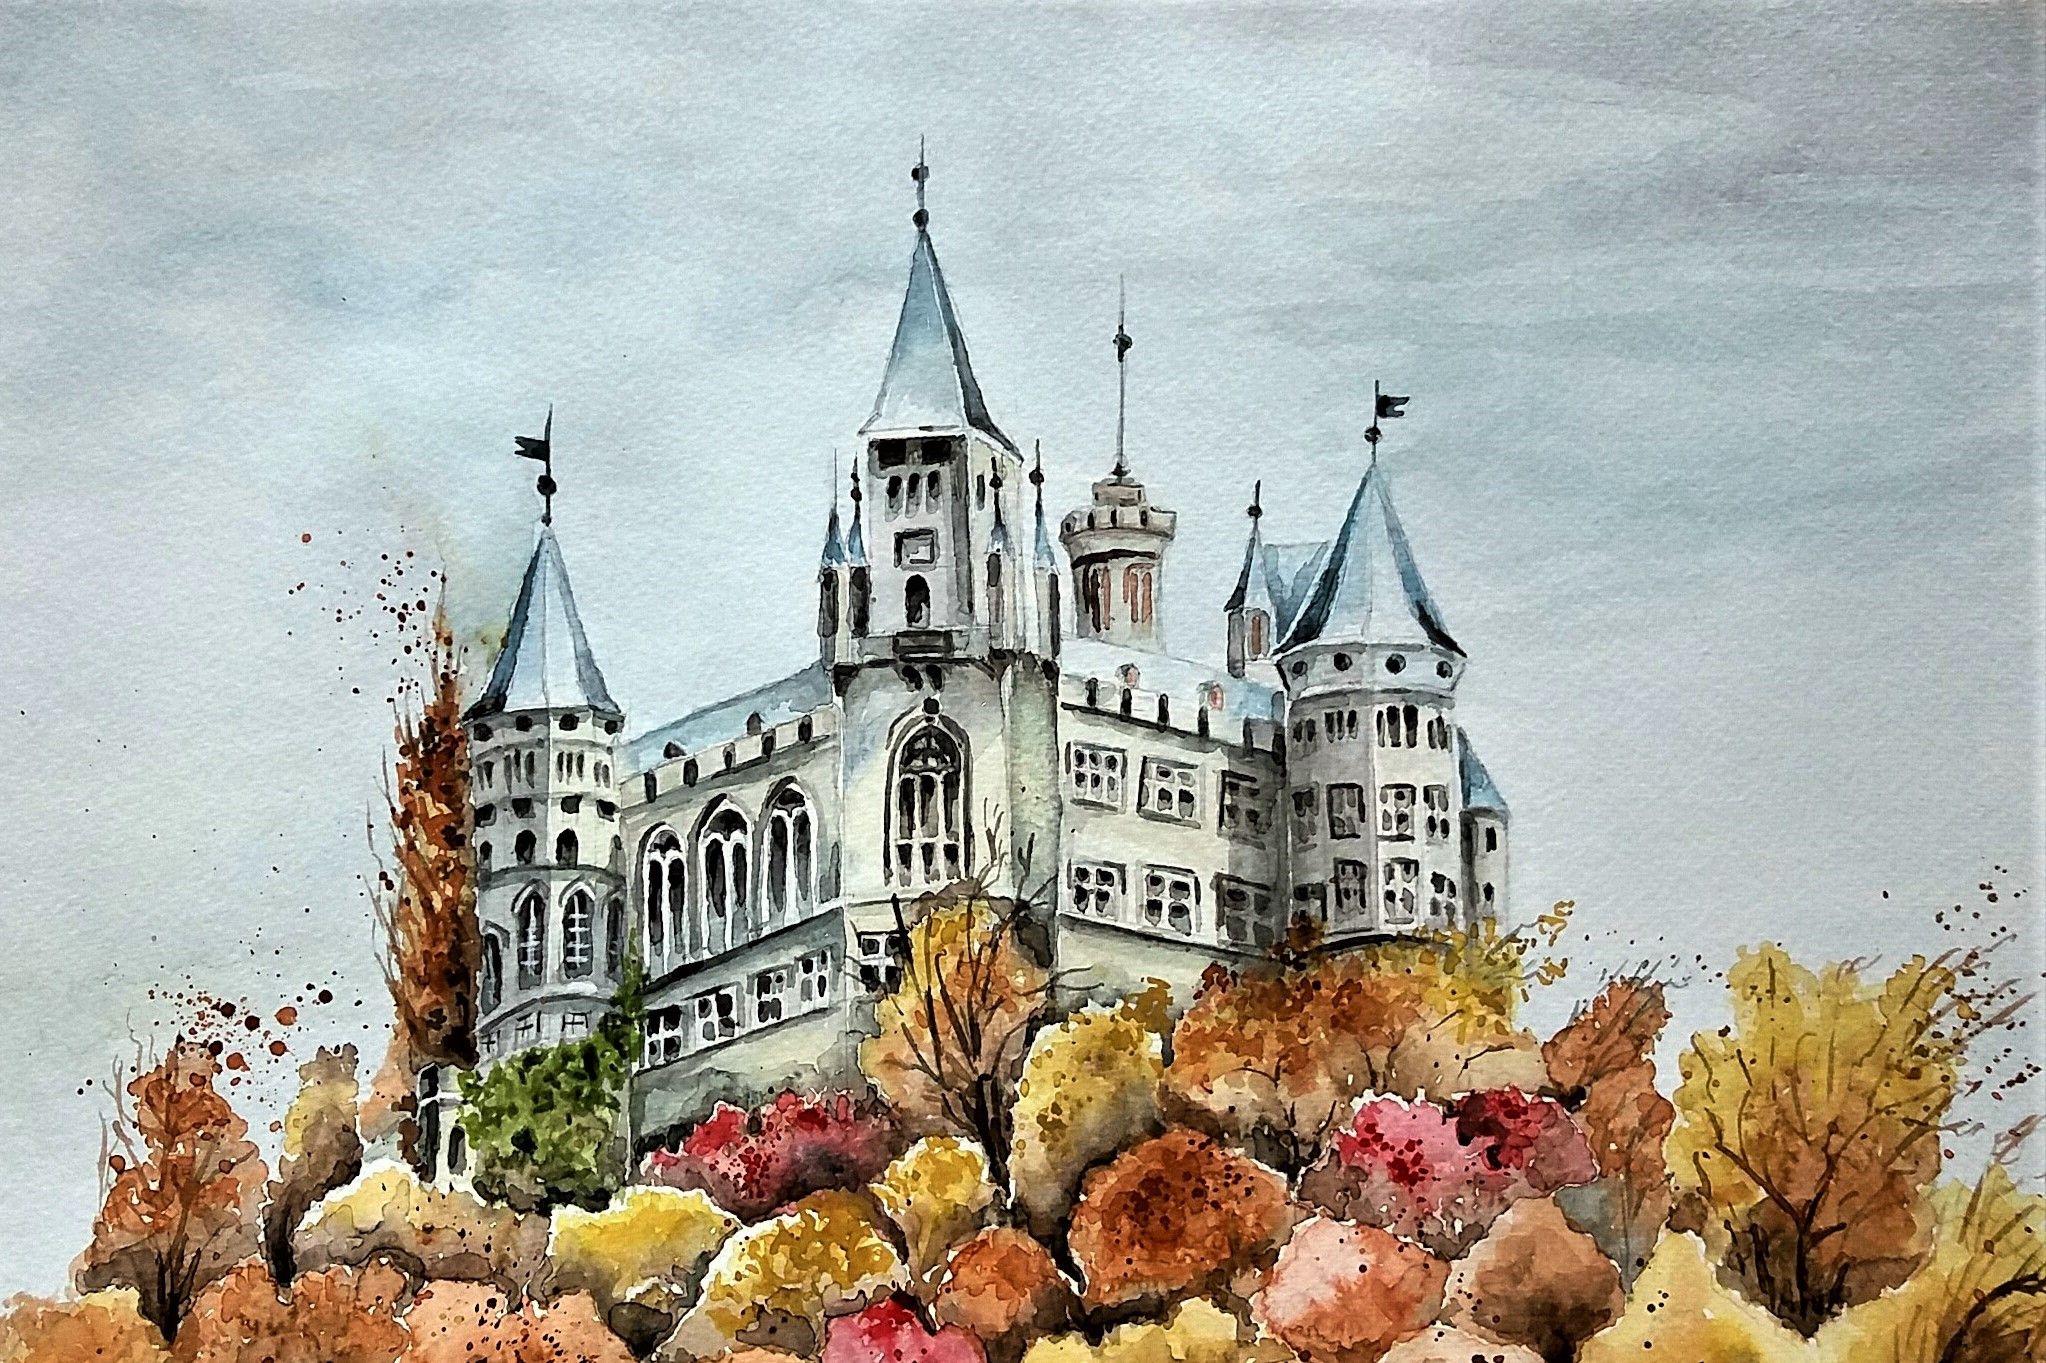 Burg Hohenzollern Aquarell Zeichnungen Aquarell Burg